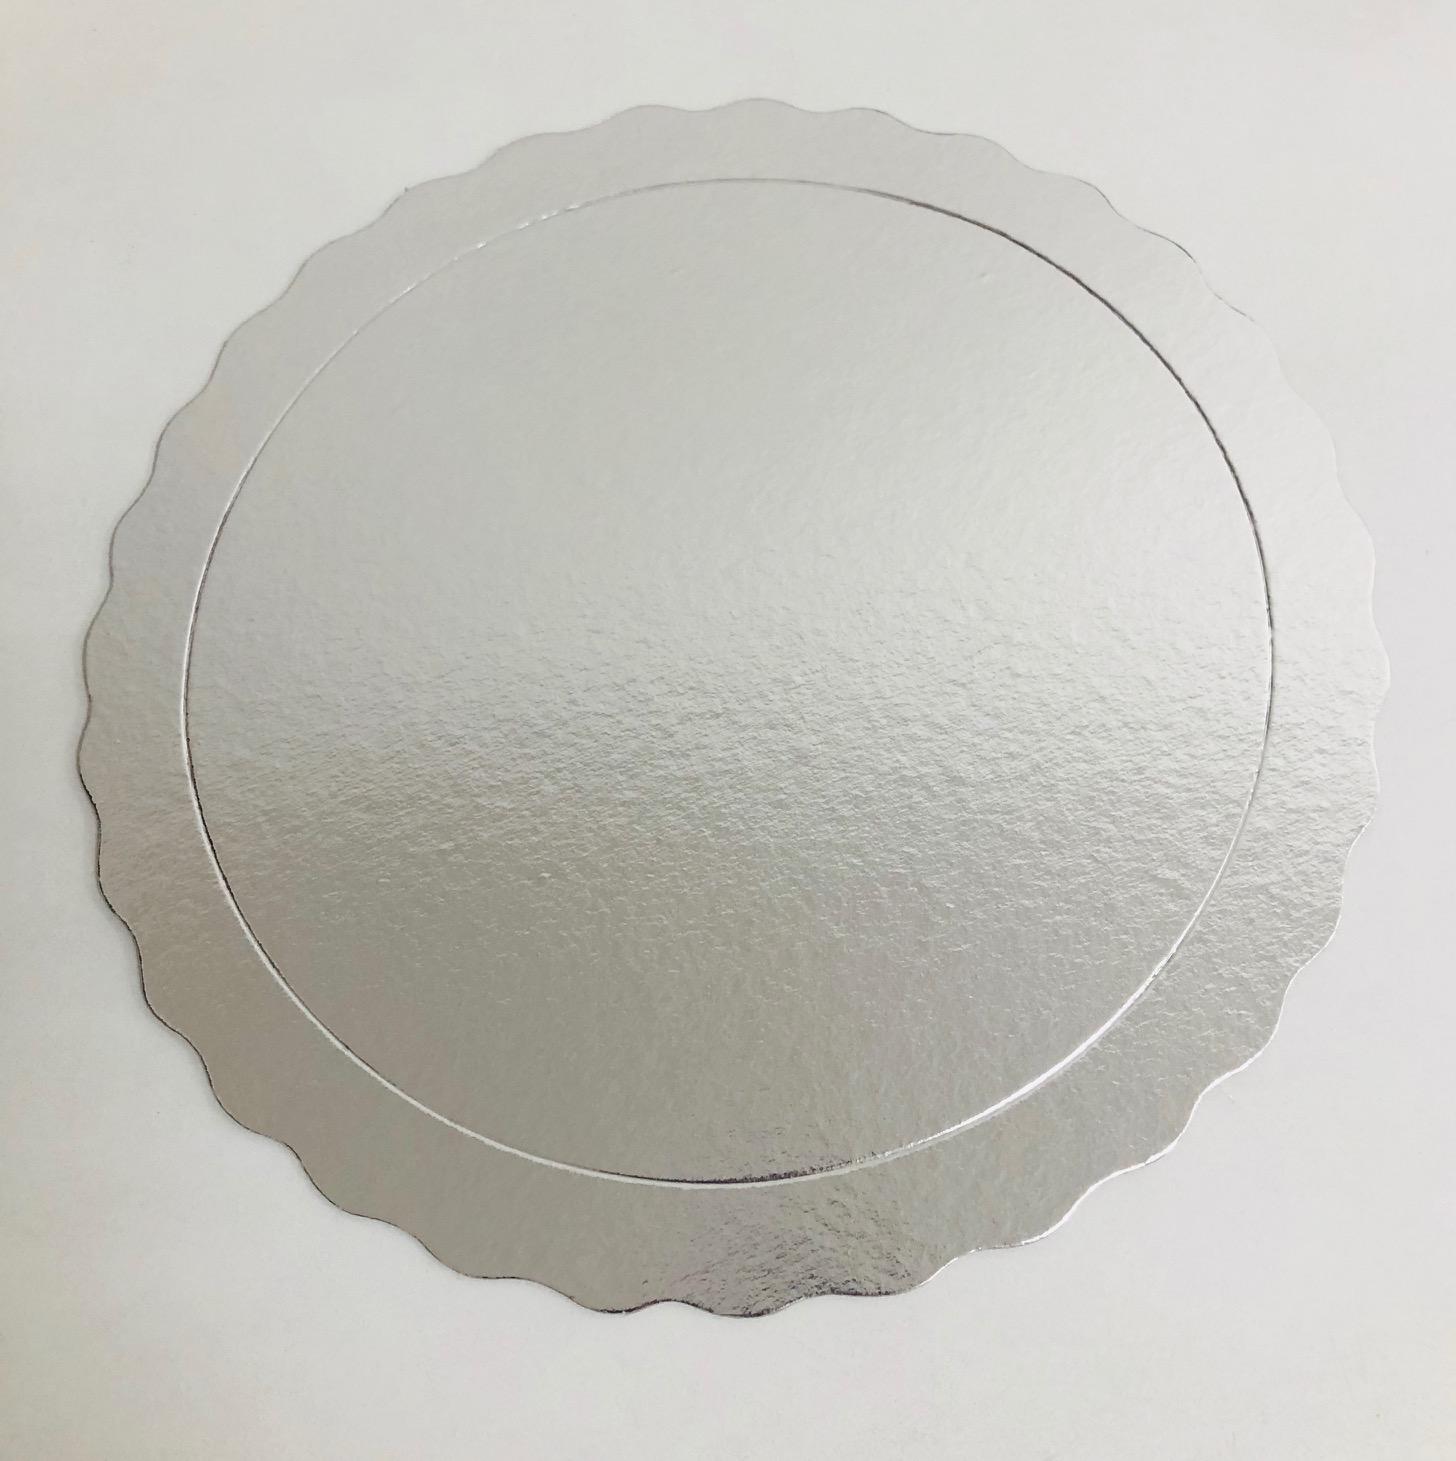 Kit 100 Bases Laminadas Para Bolo, Cake Board, 15, 20 e 25cm - Prata